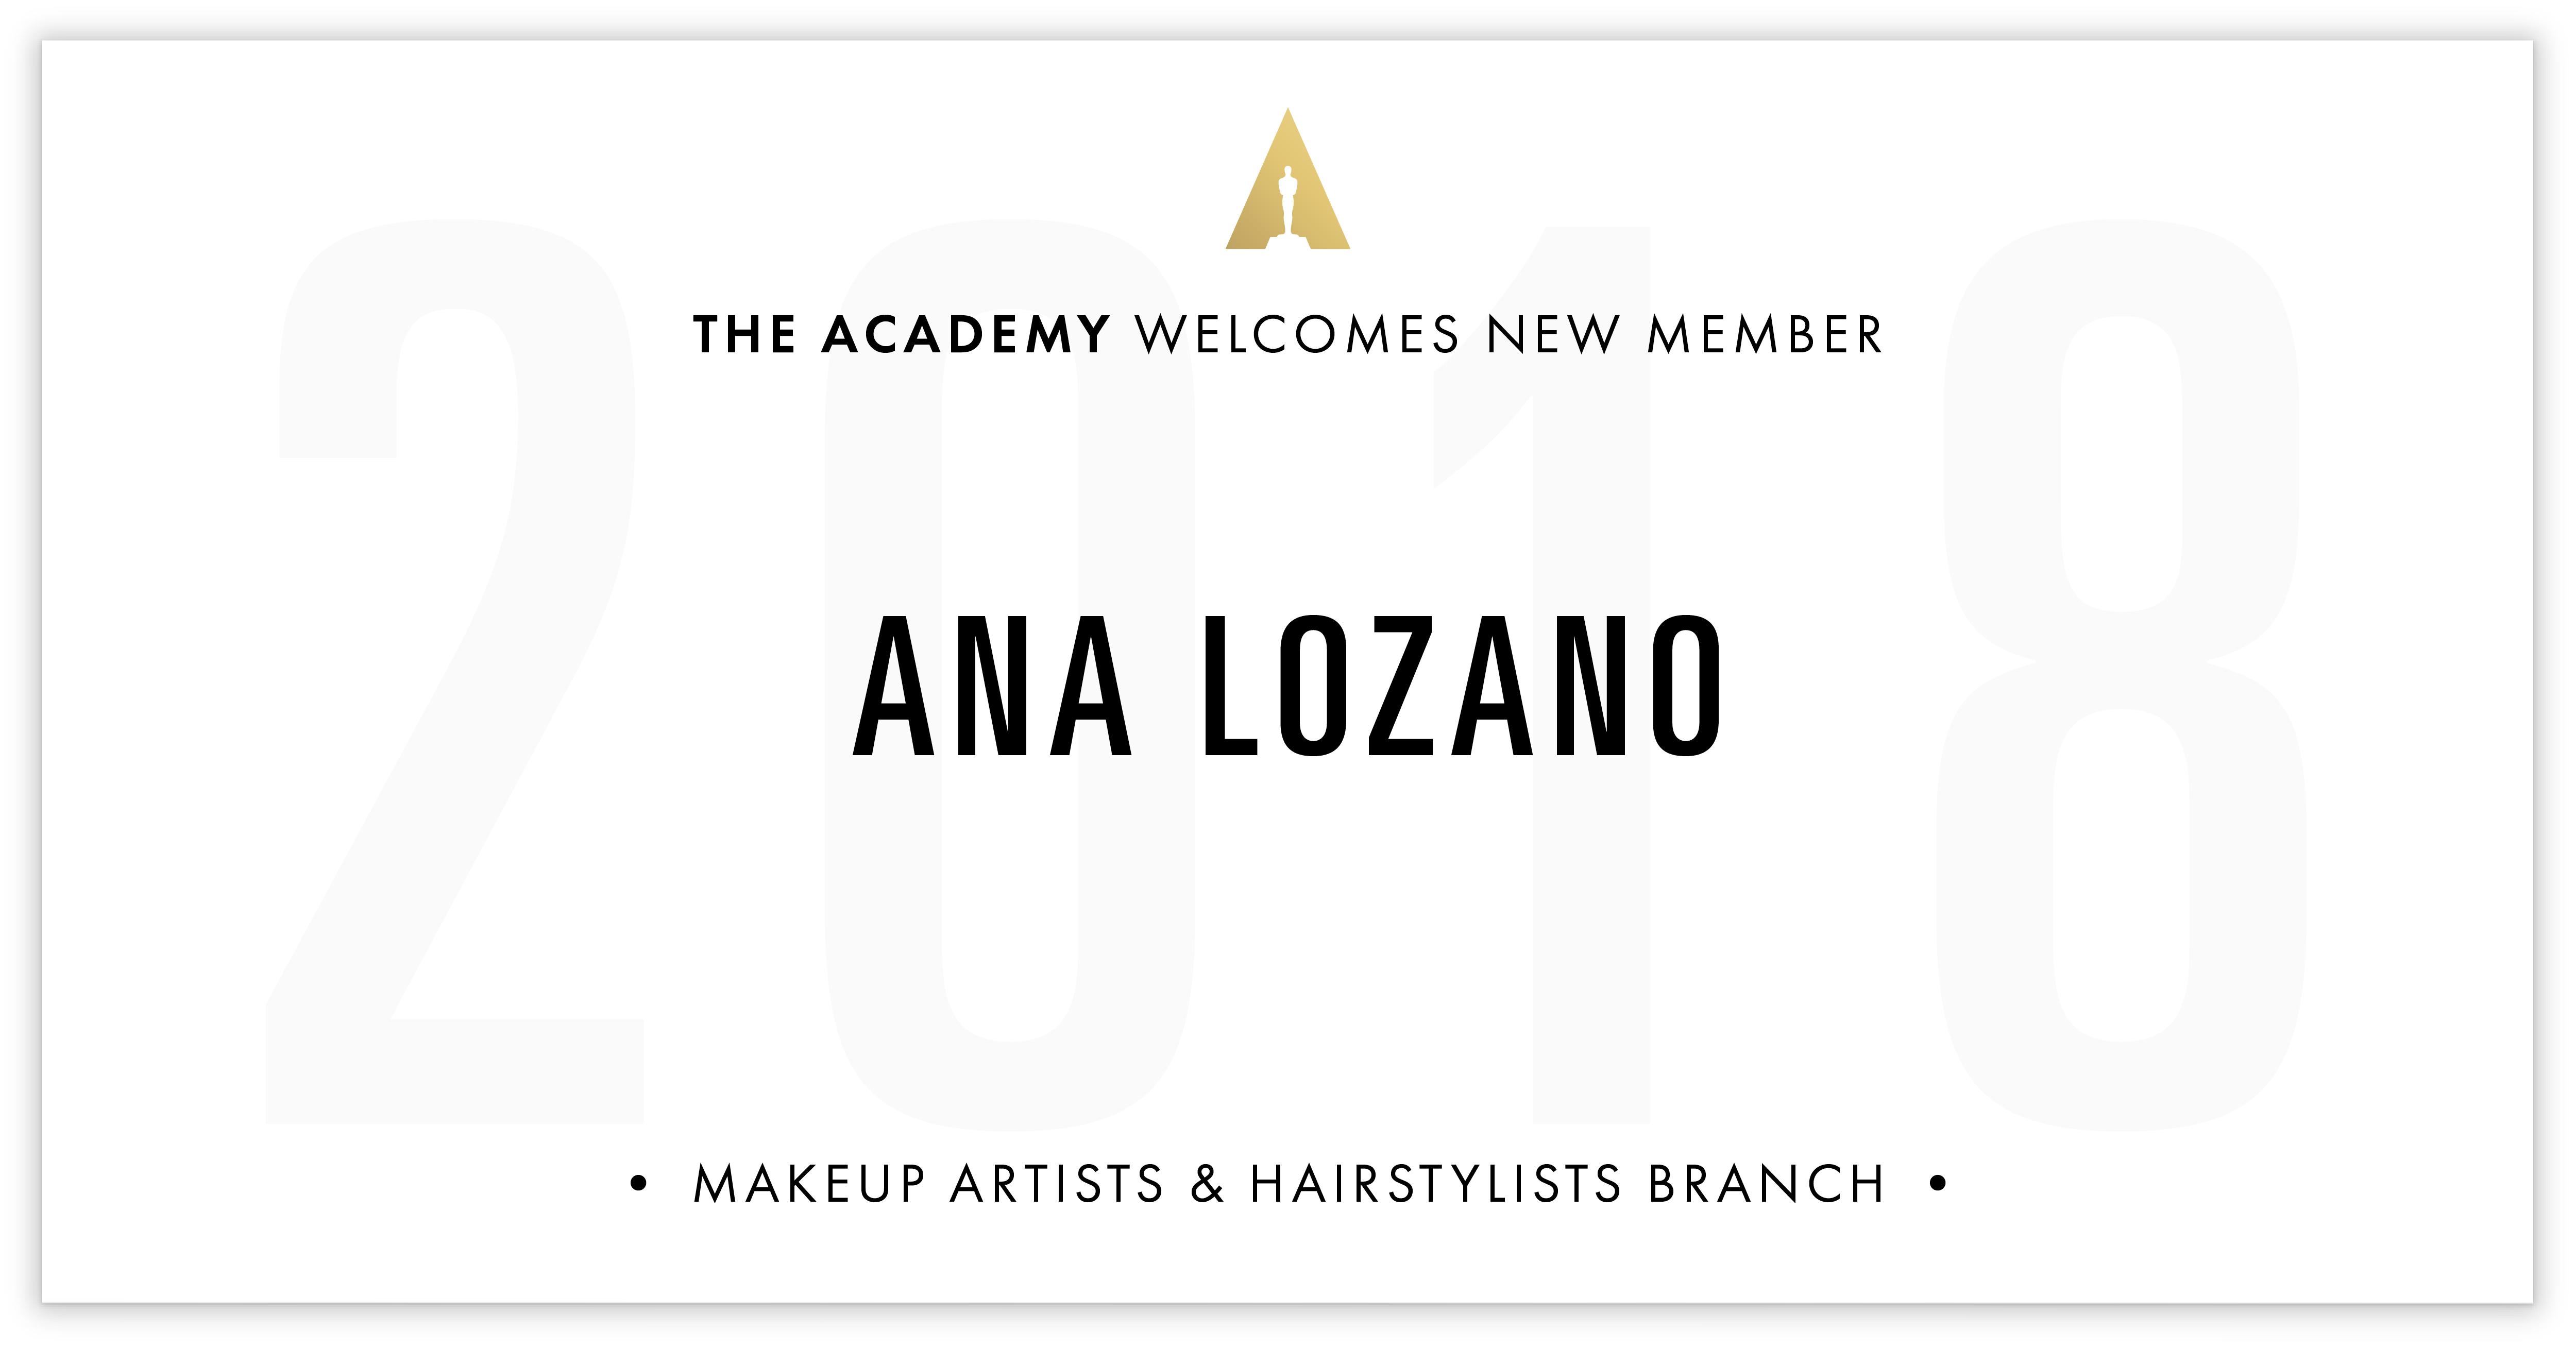 Ana Lozano is invited!